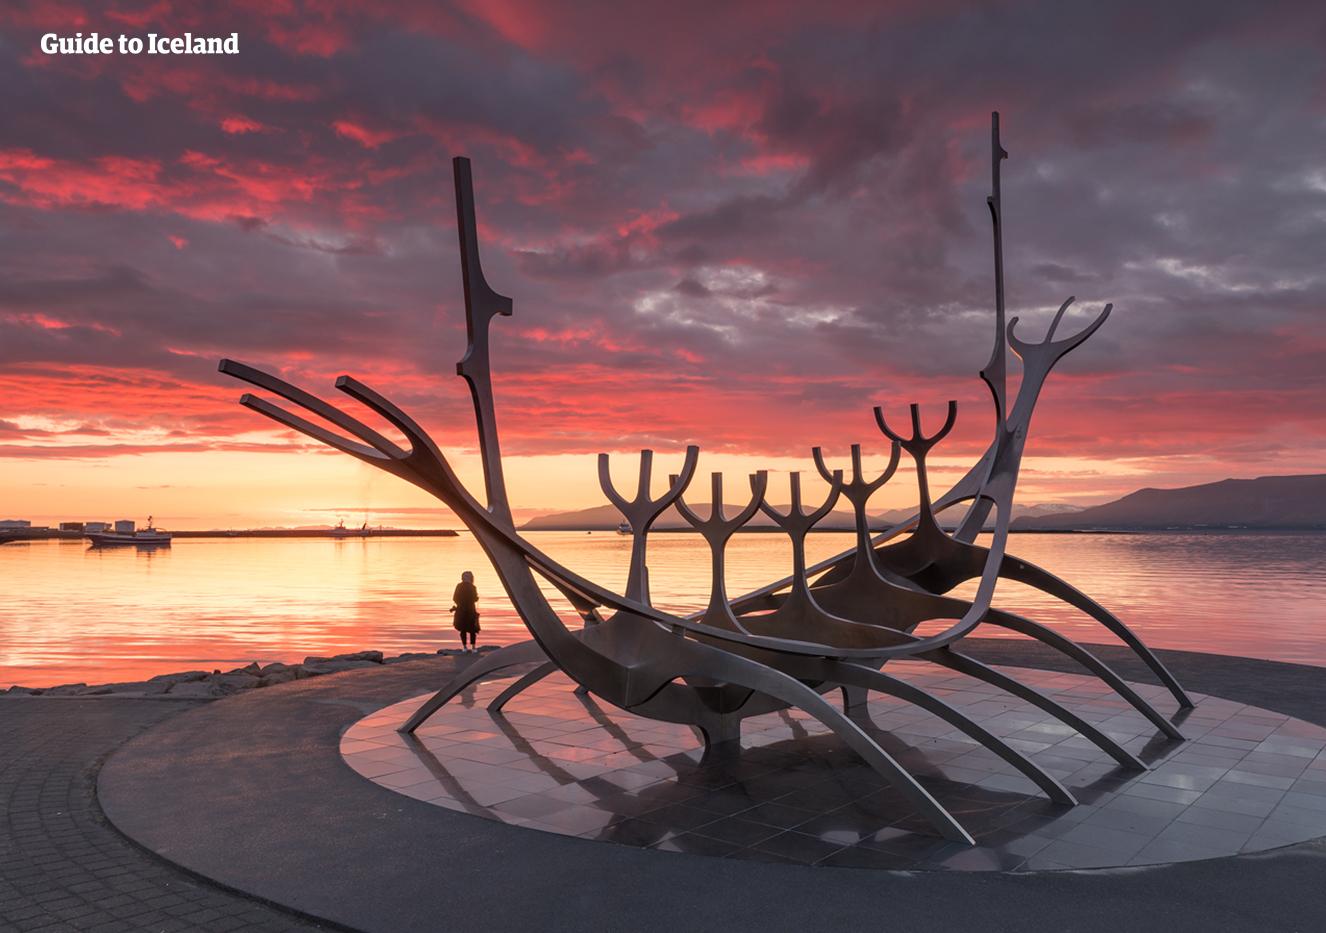 The Sun Voyager landmark basked in midnight sun in downtown Reykjavik